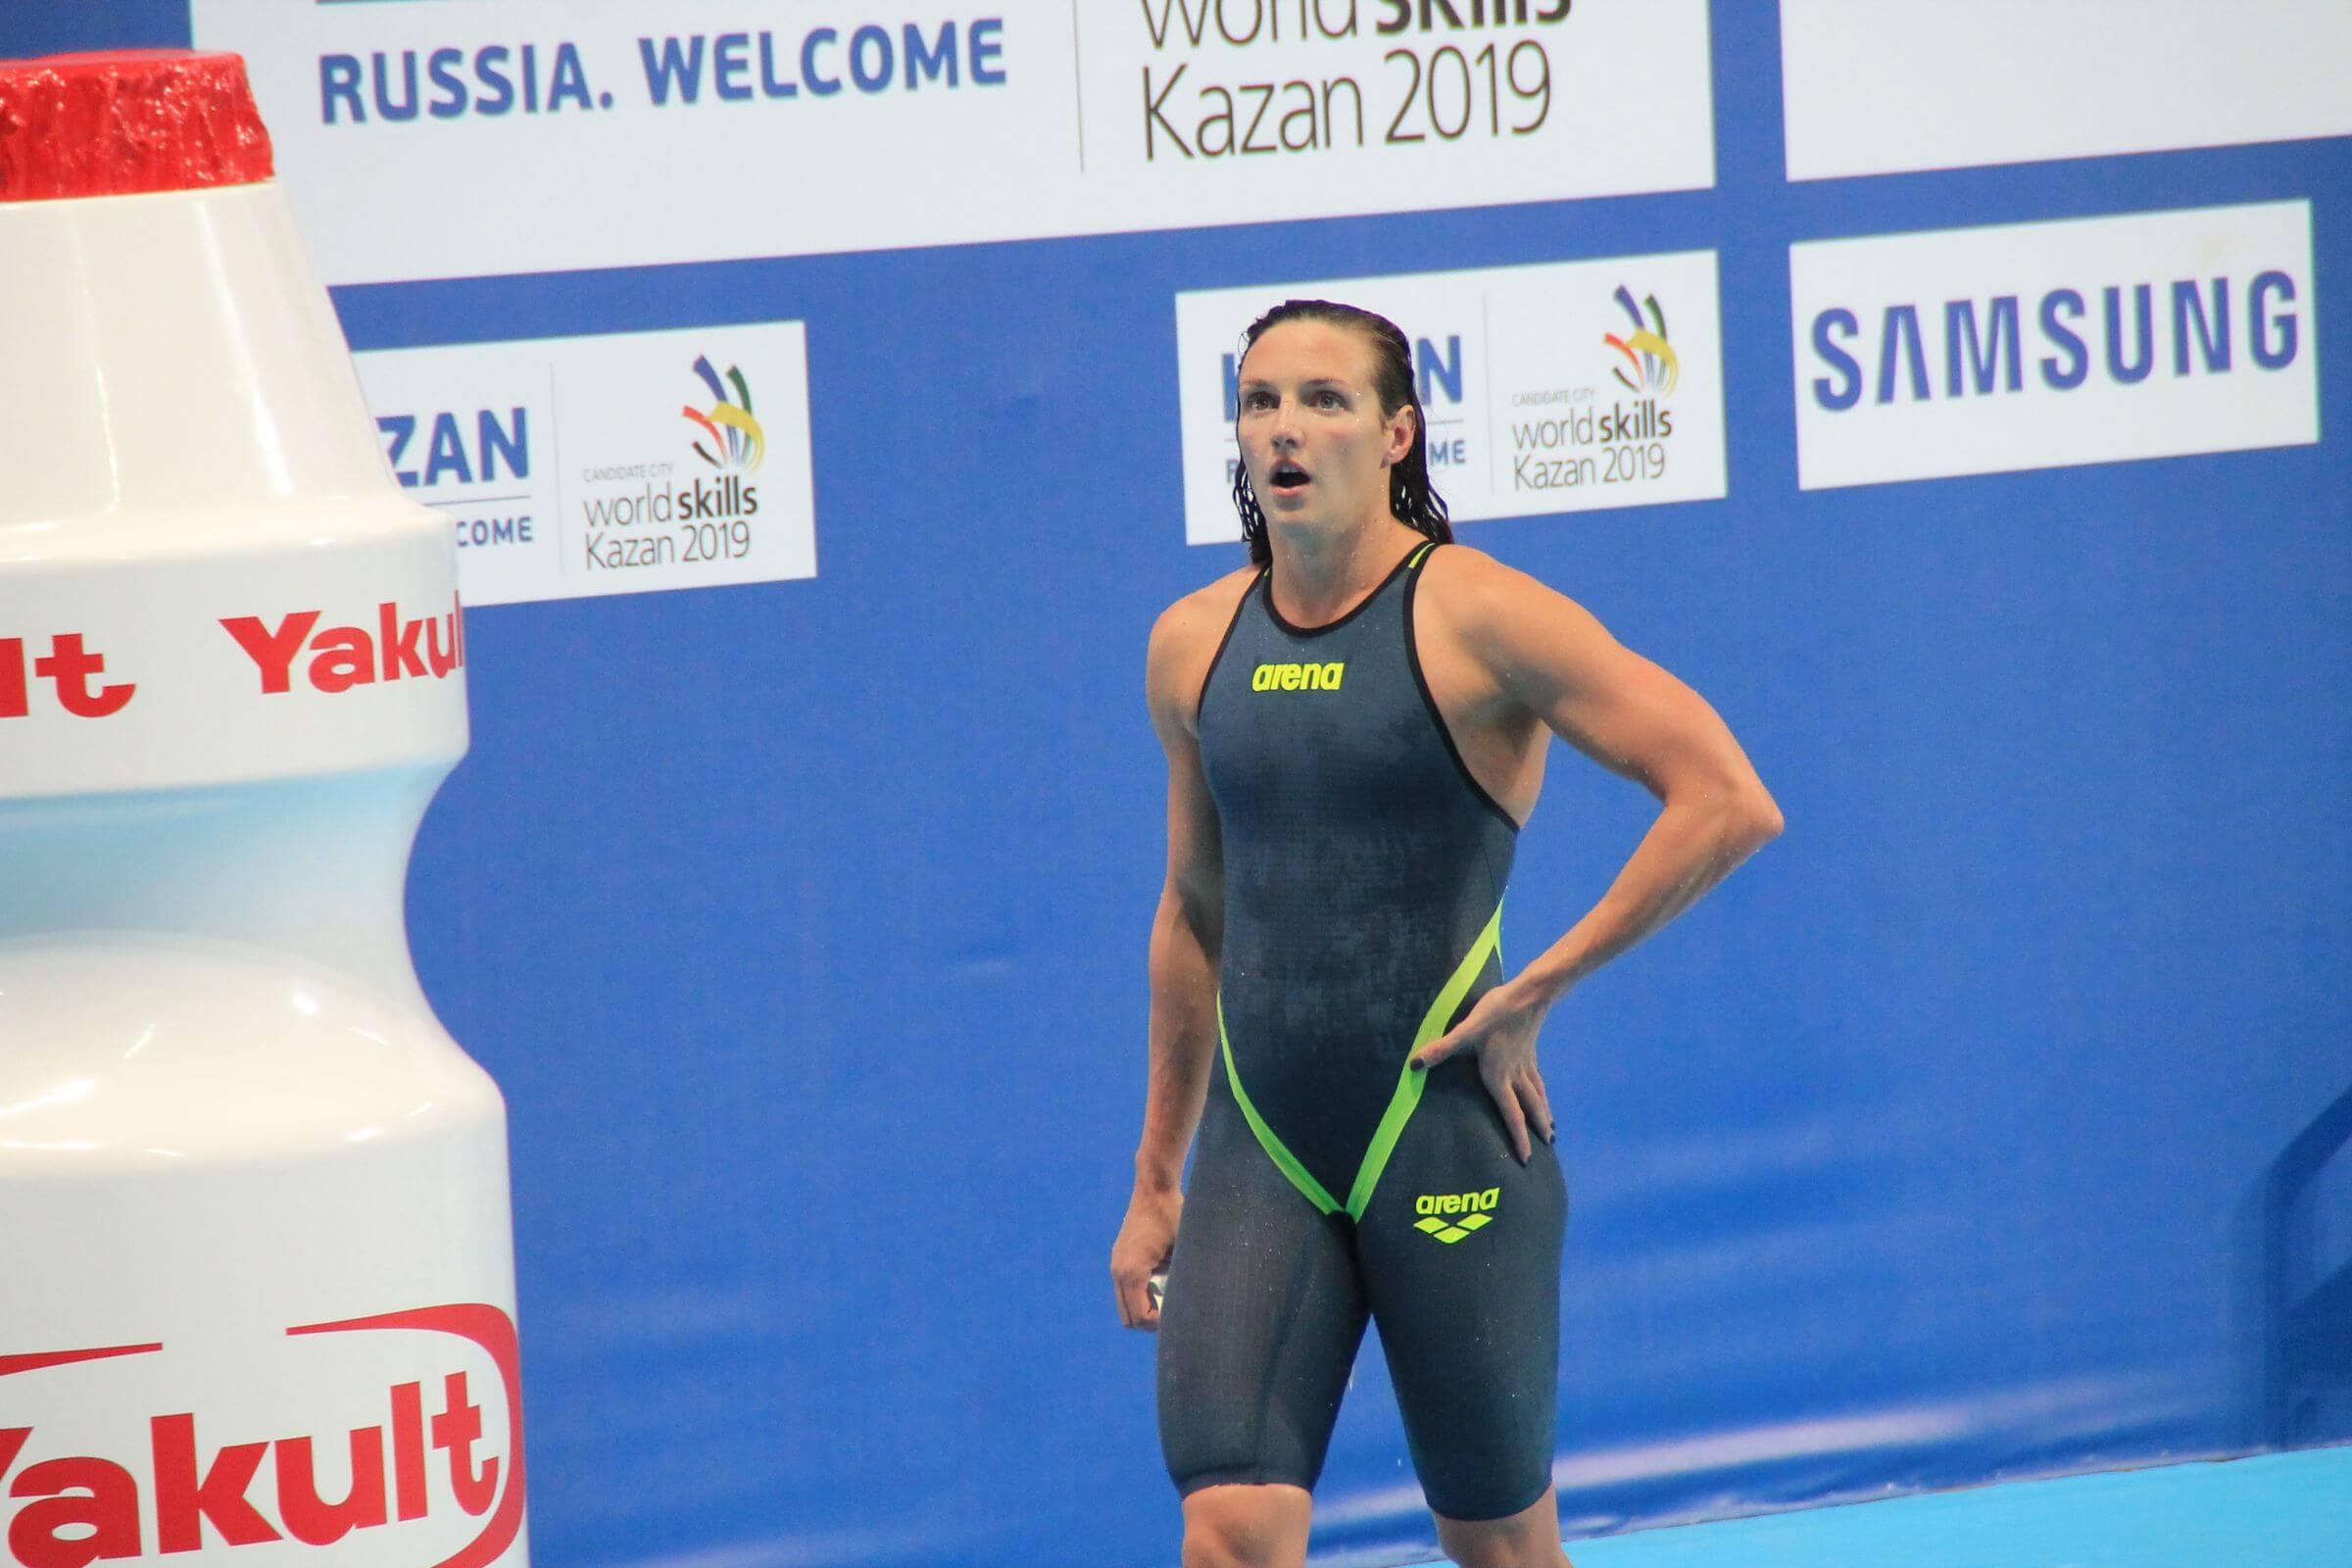 katinka-hosszu-world-championships-2015 (1)